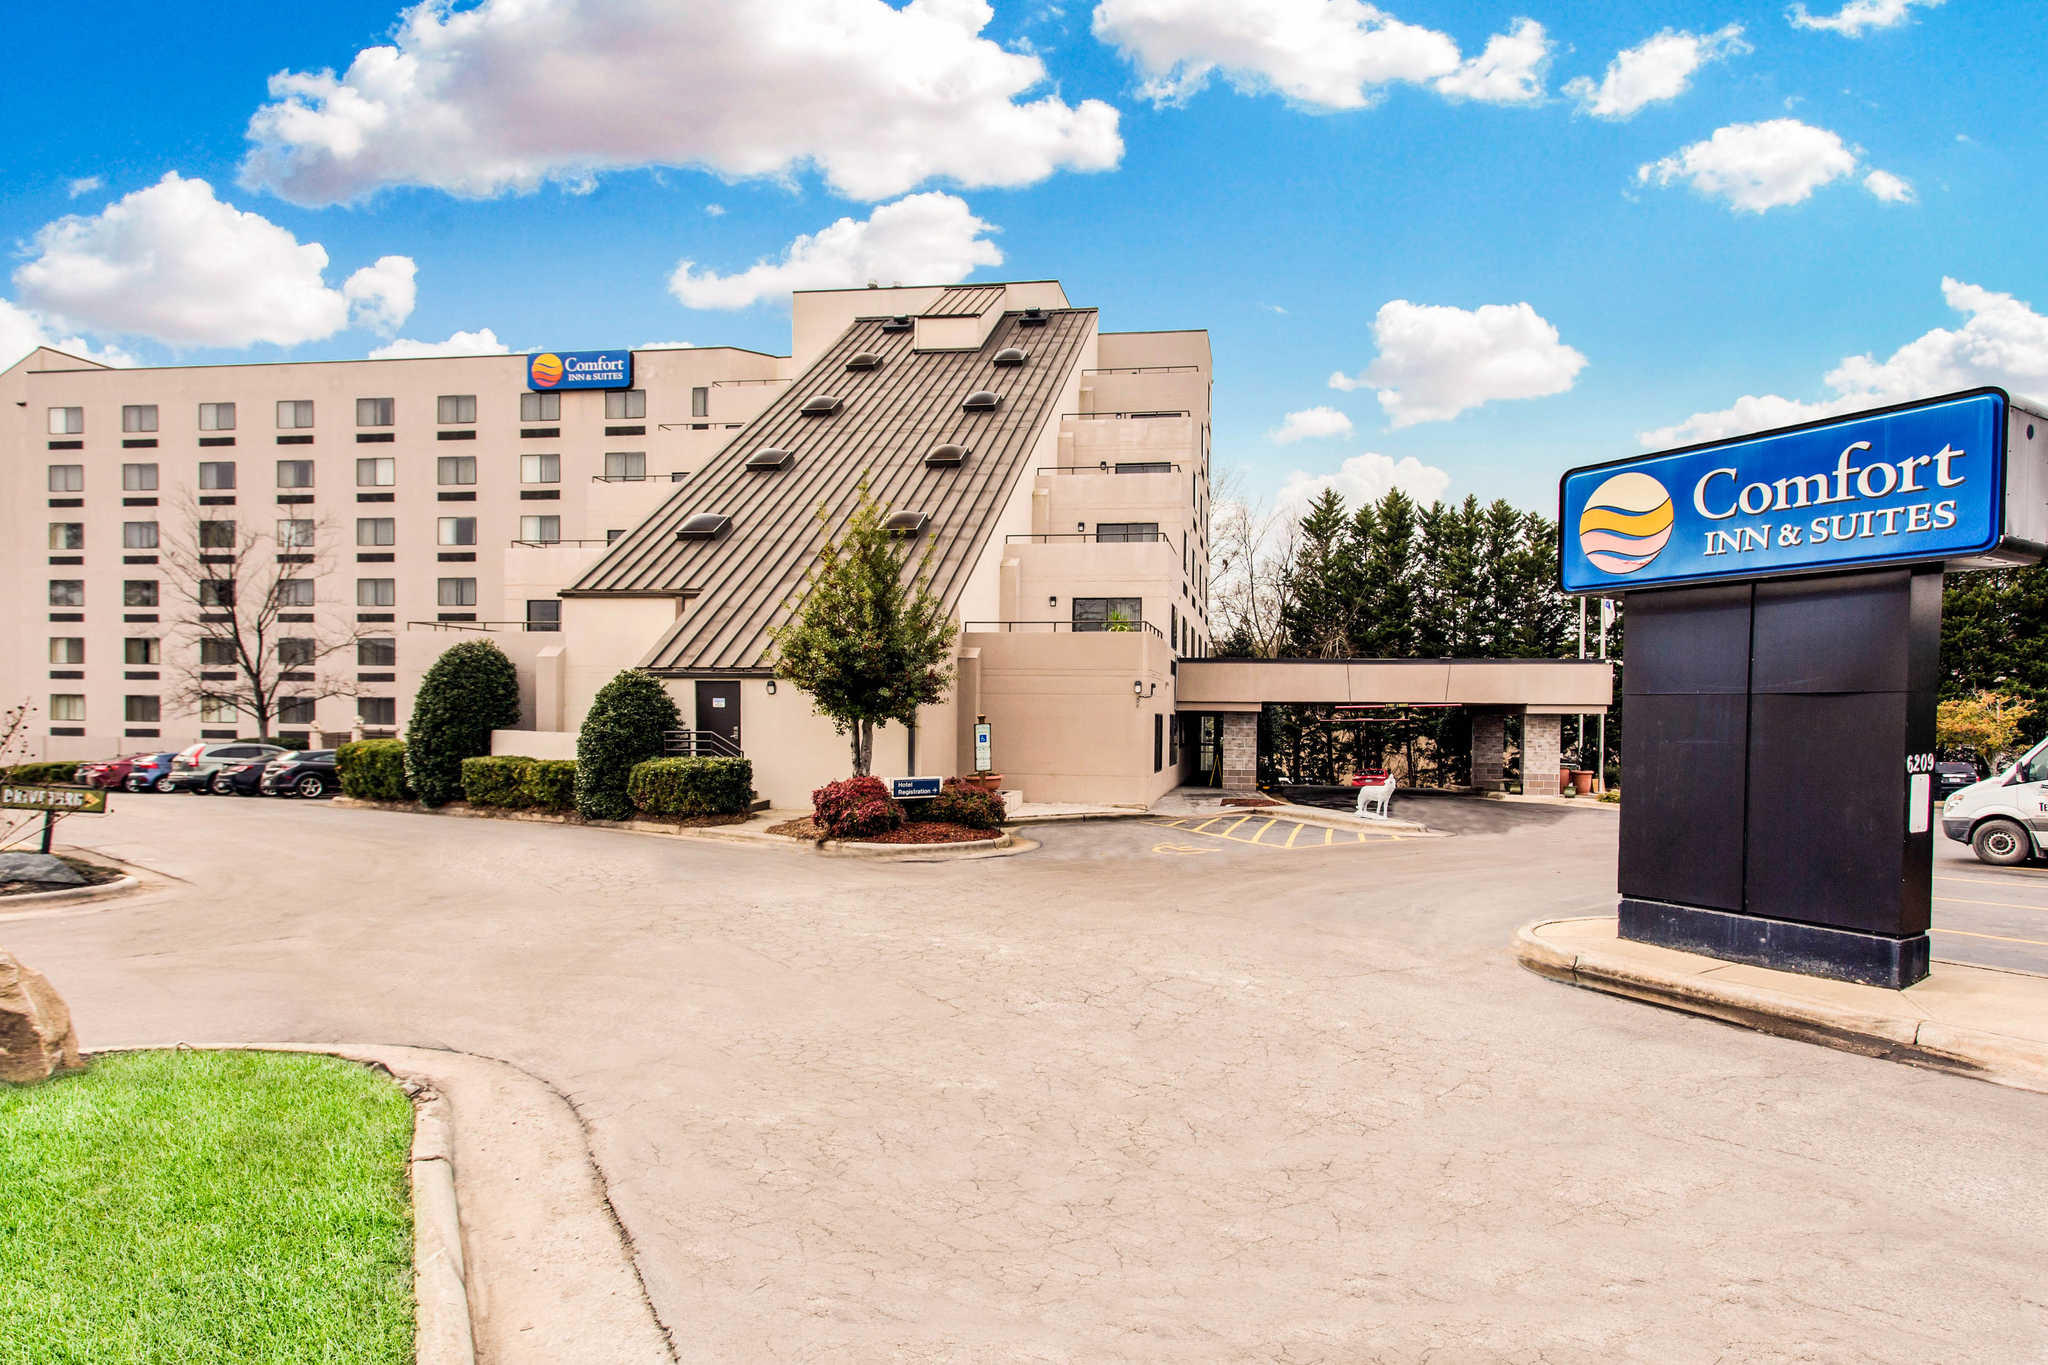 Comfort Inn & Suites Crabtree Valley image 0